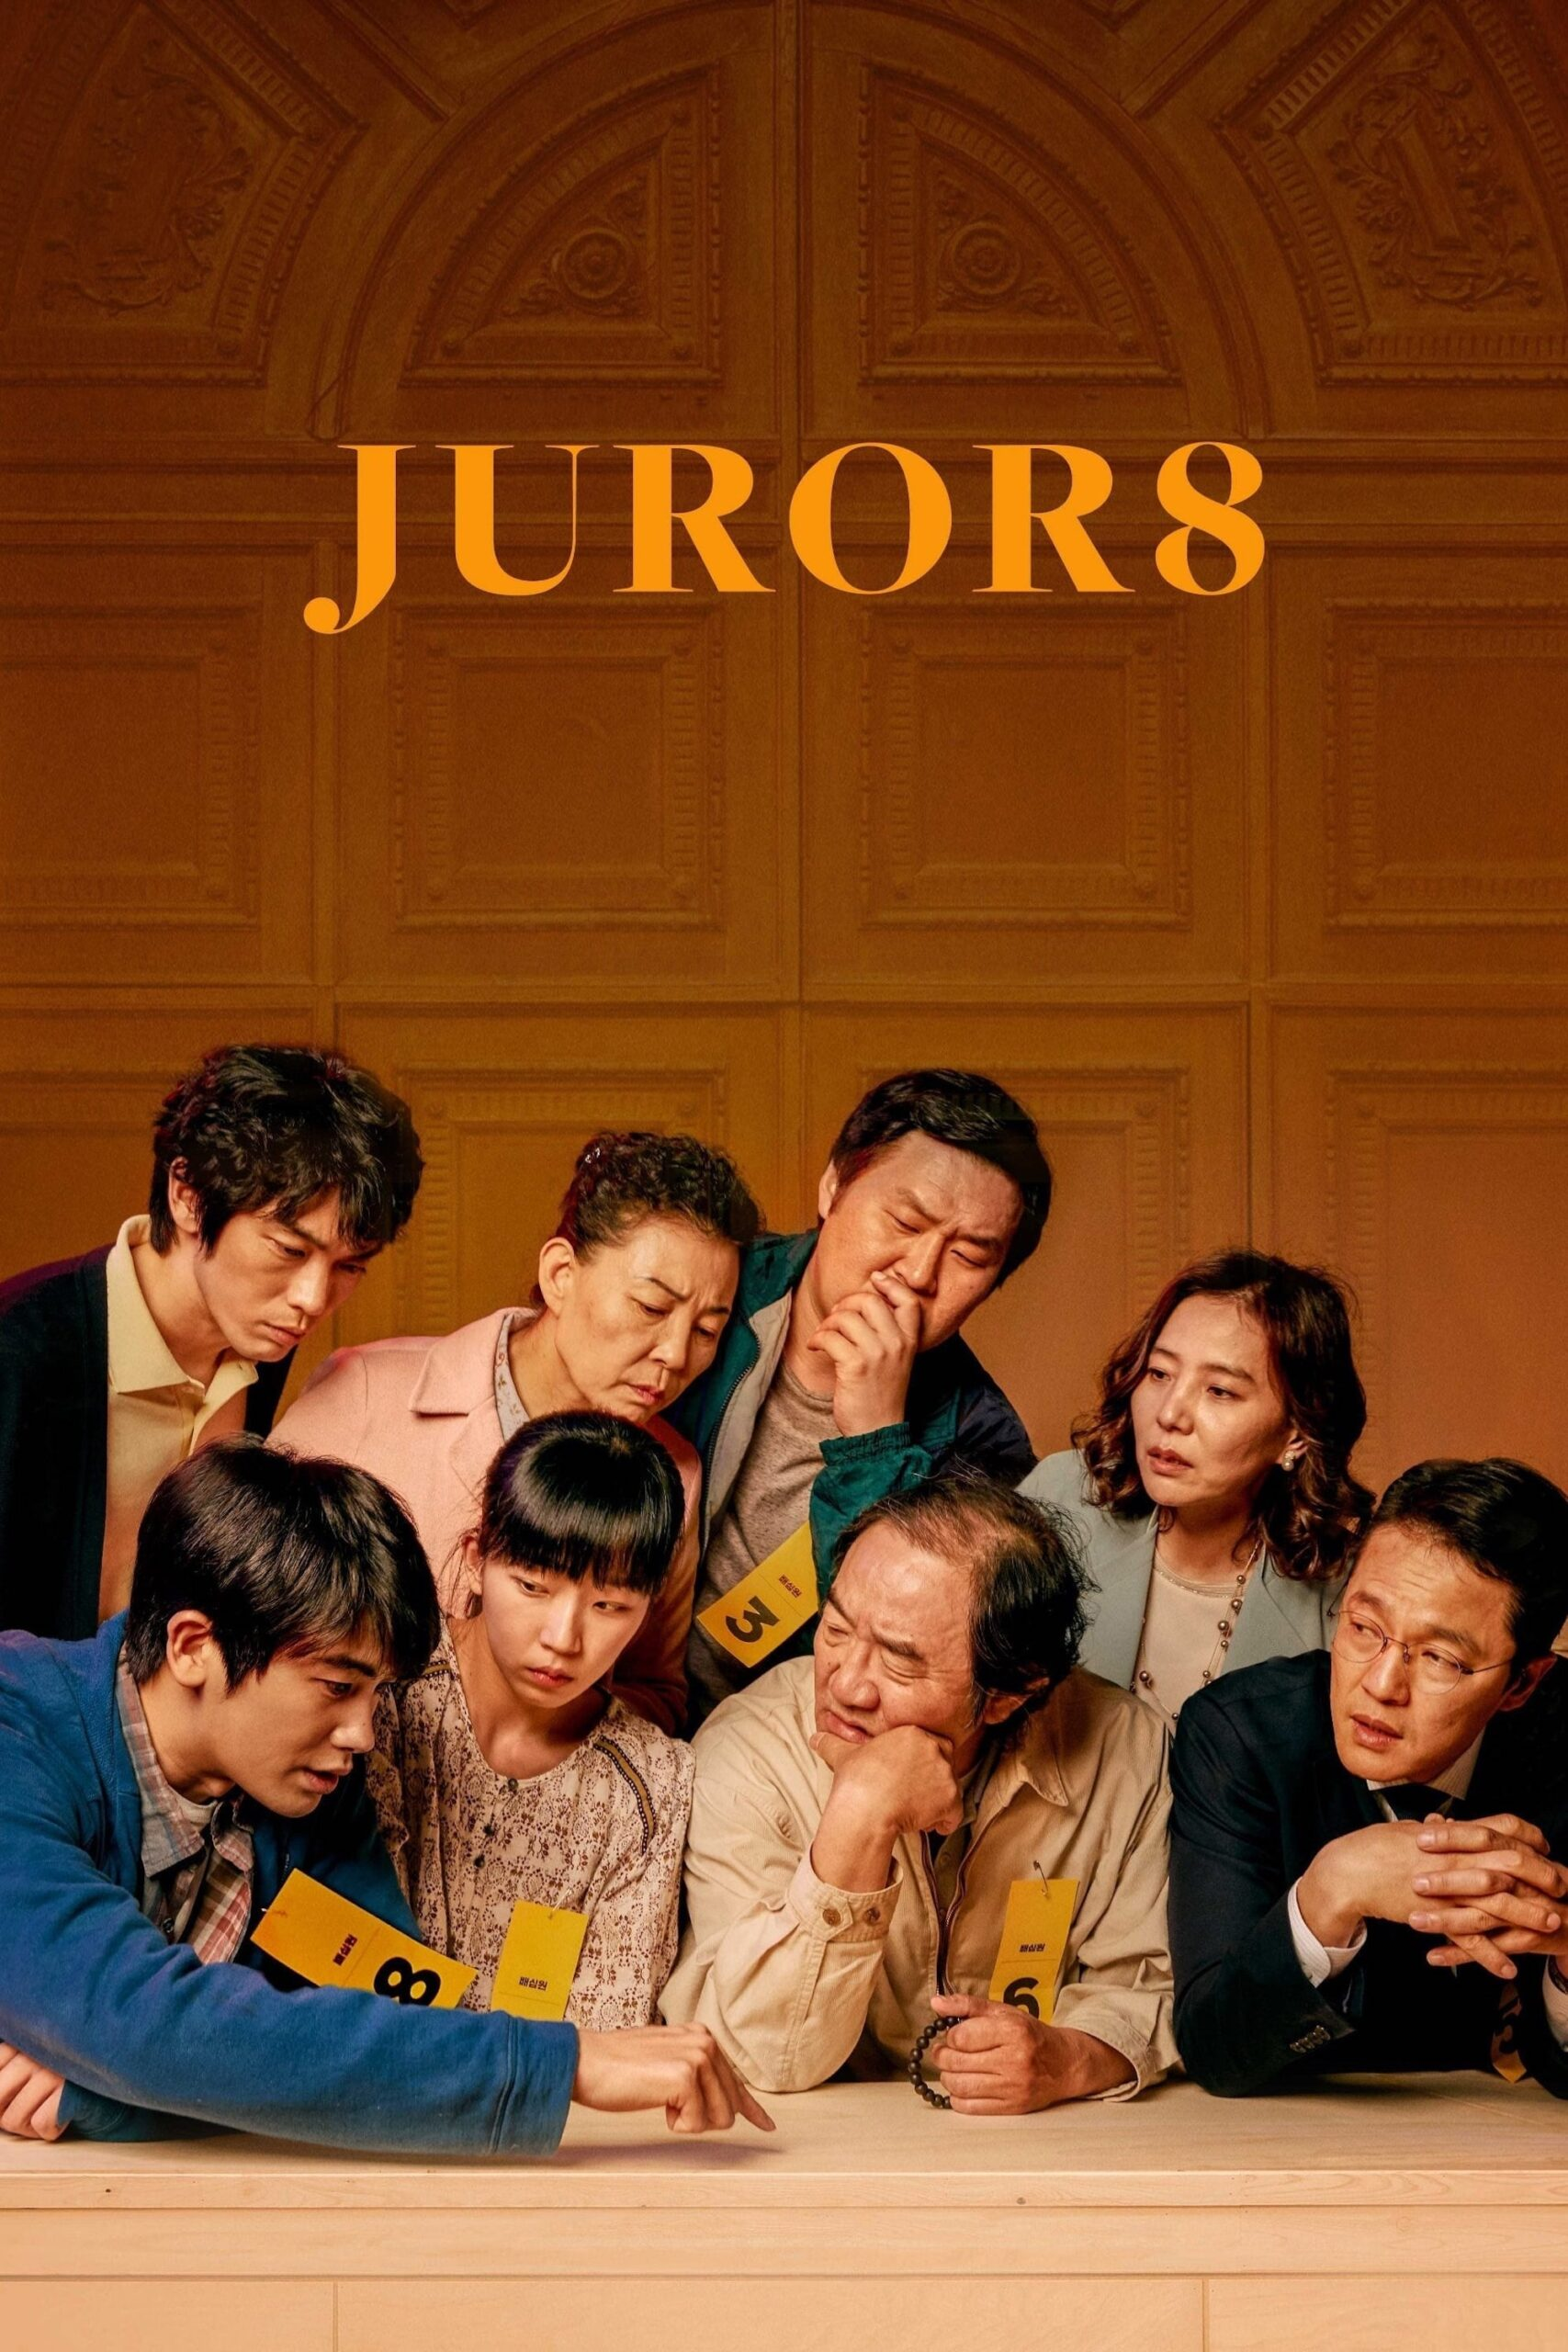 Juror 8 Movie Streaming Online